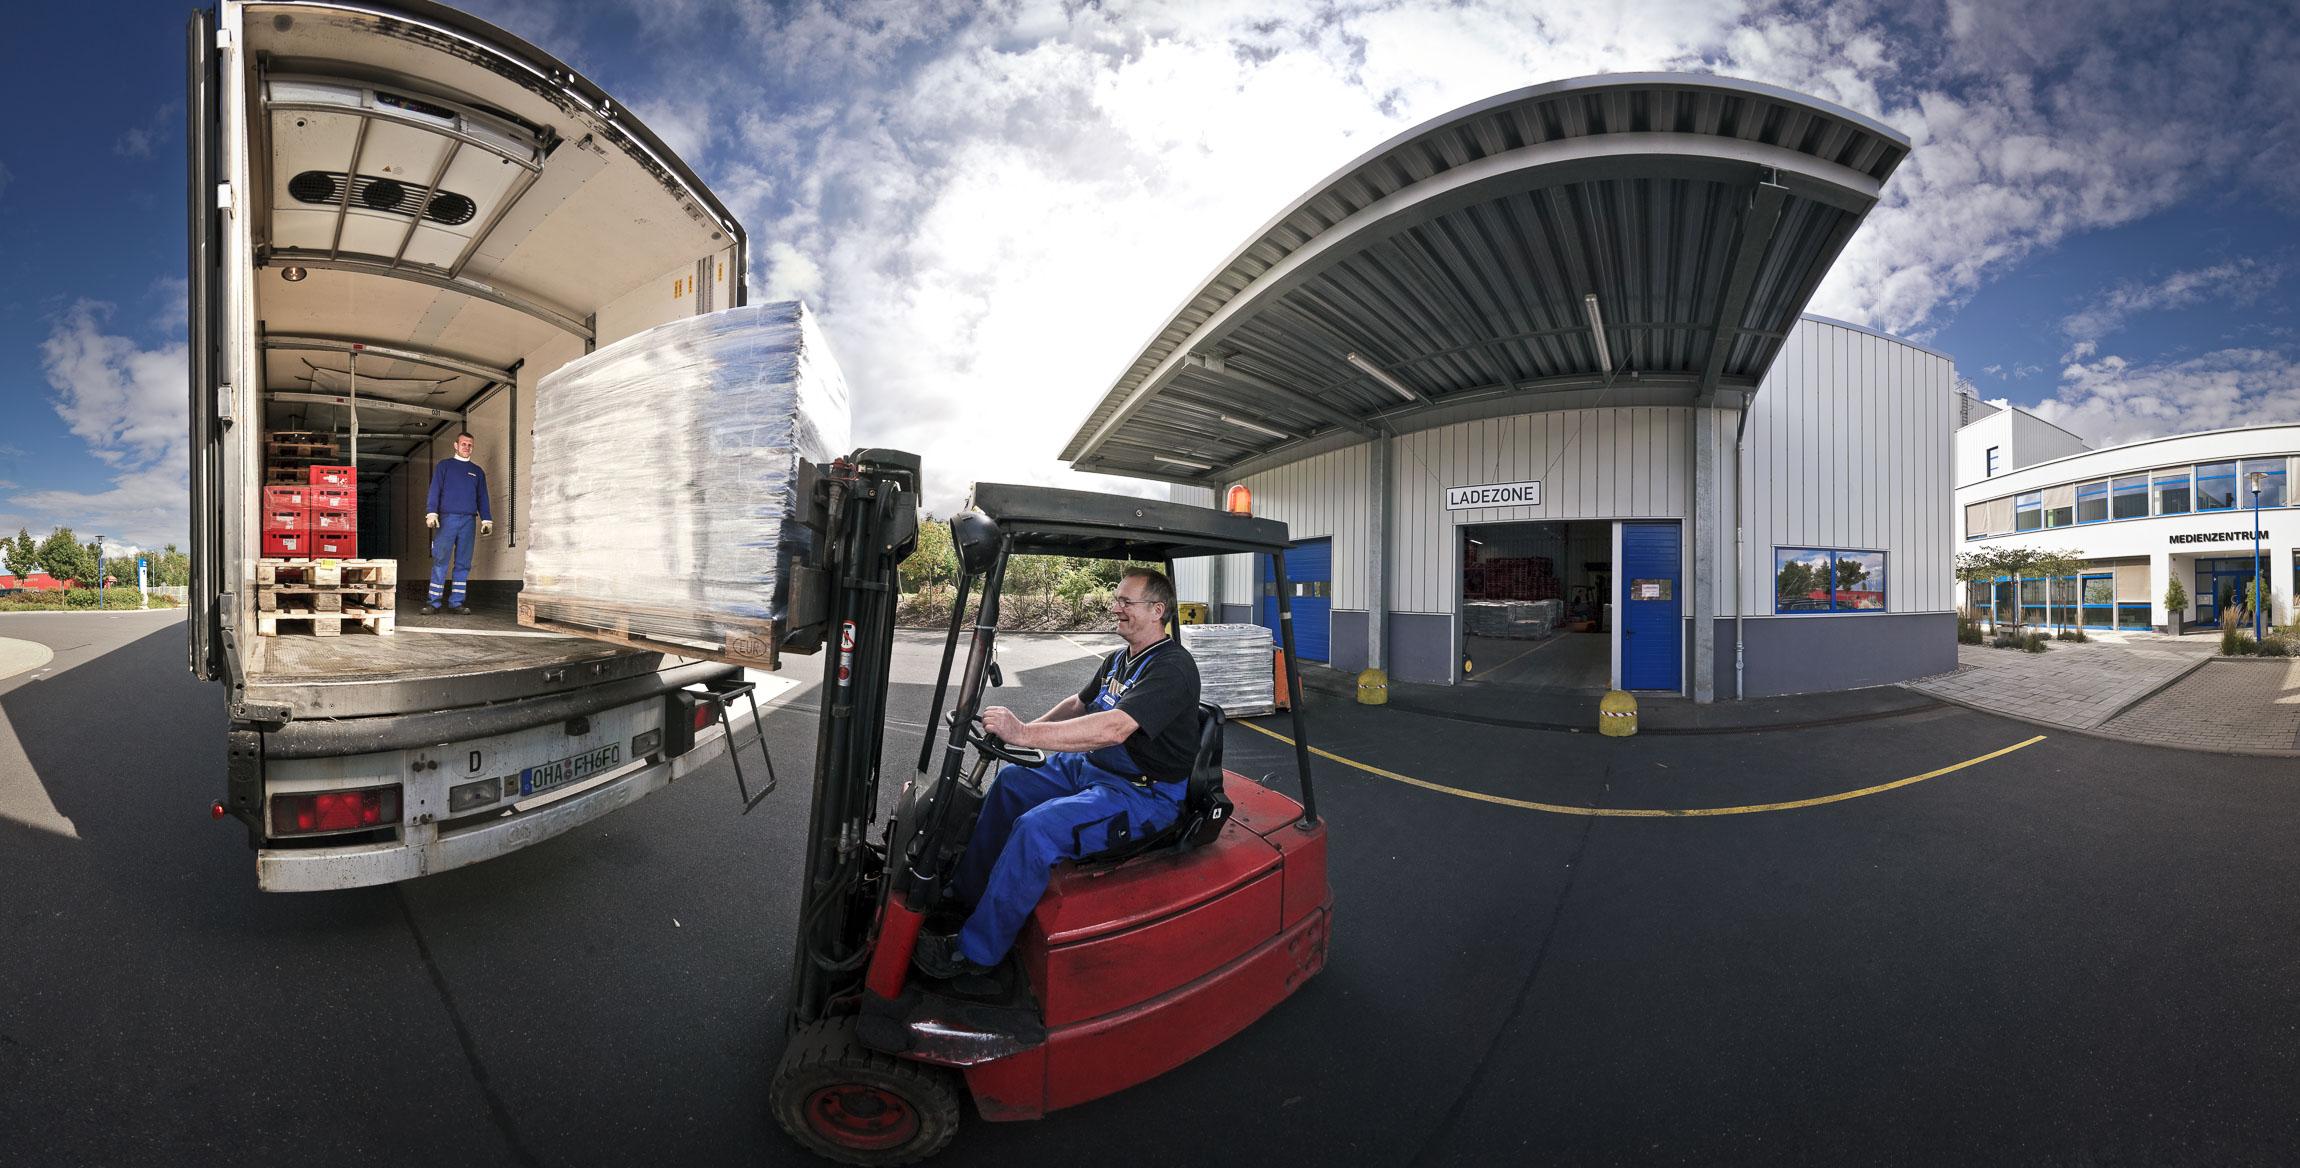 360 Video zeigt Druckerei. Hier: Beladen des LKW.